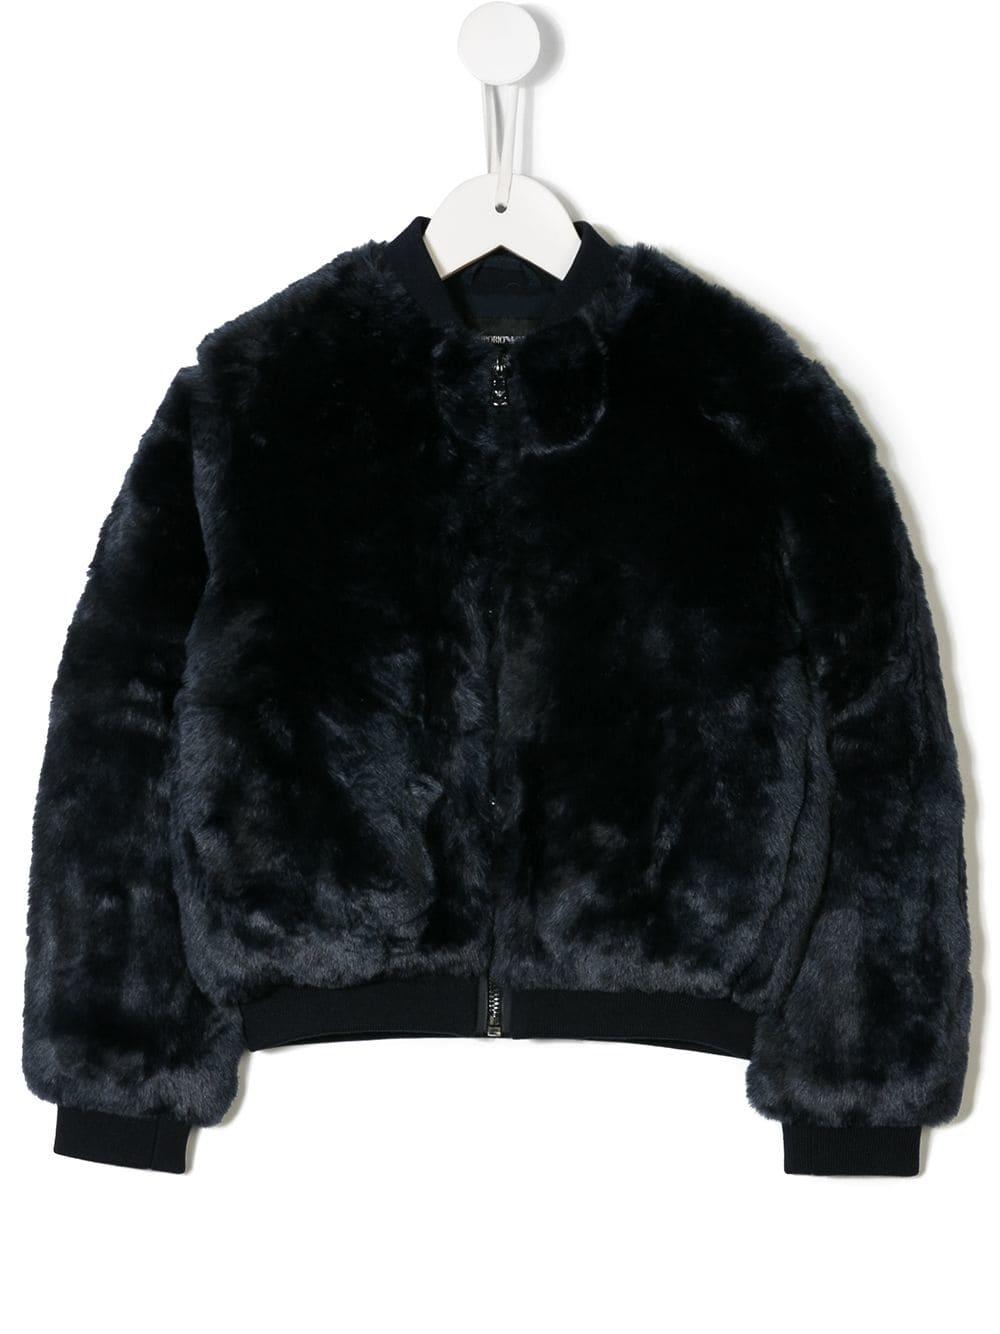 Emporio Armani Kids Faux Fur Jacket Blue Products In 2019 Armani Kids Faux Fur Jacket Fur Jacket